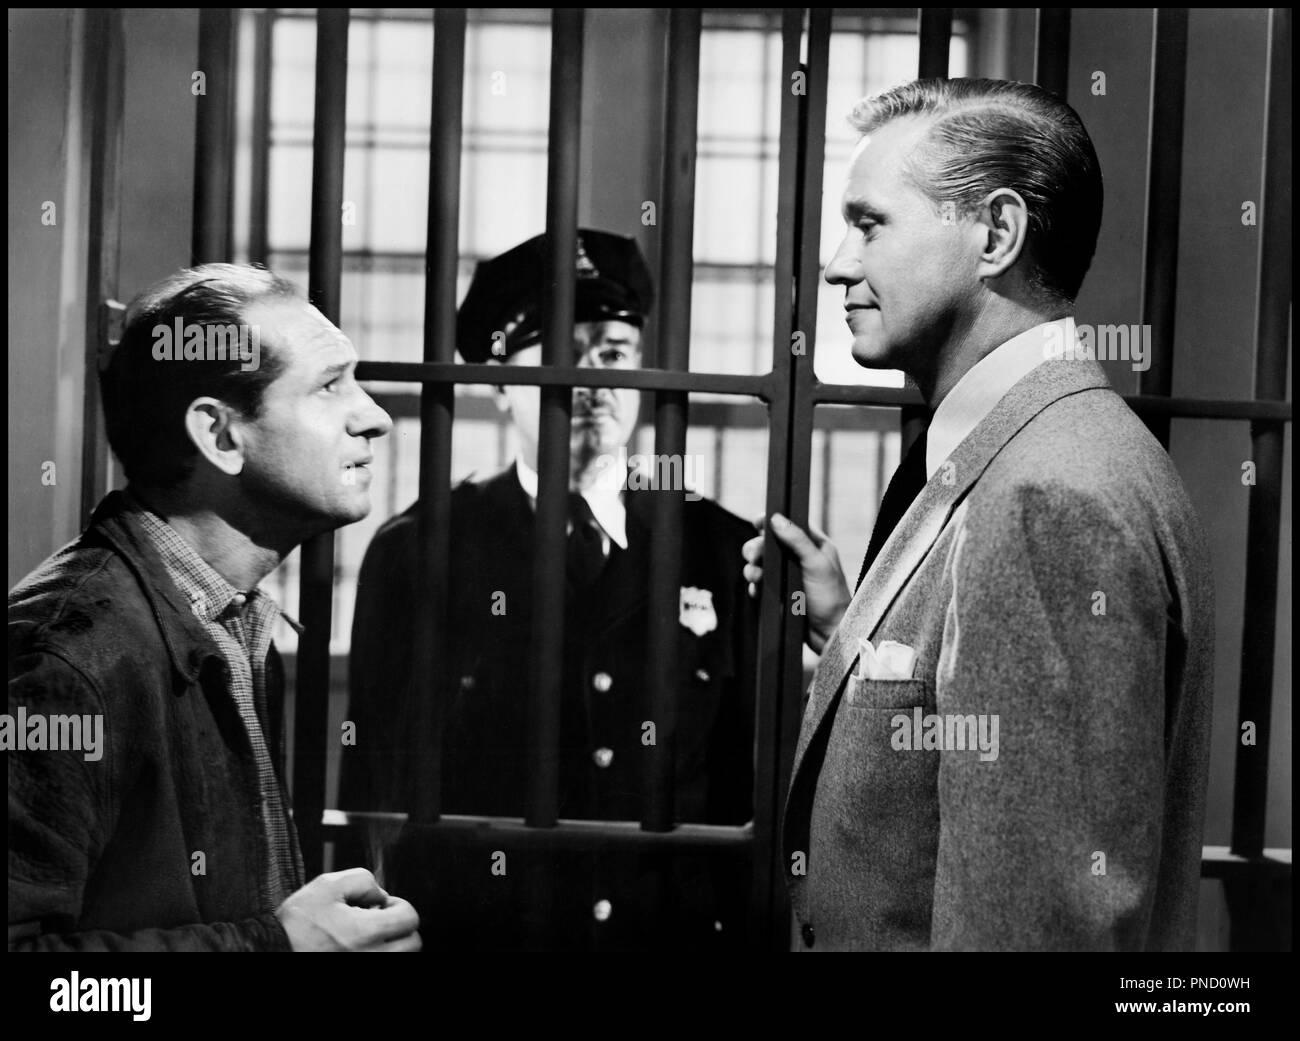 Prod DB © Warner Bros. Pictures / DR GENTLEMAN CAMBRIOLEUR (THE GREAT JEWEL ROBBER) de Peter Godfrey 1950 USA avec Ned Glass et David Brian cellule, visiteur de prison - Stock Image